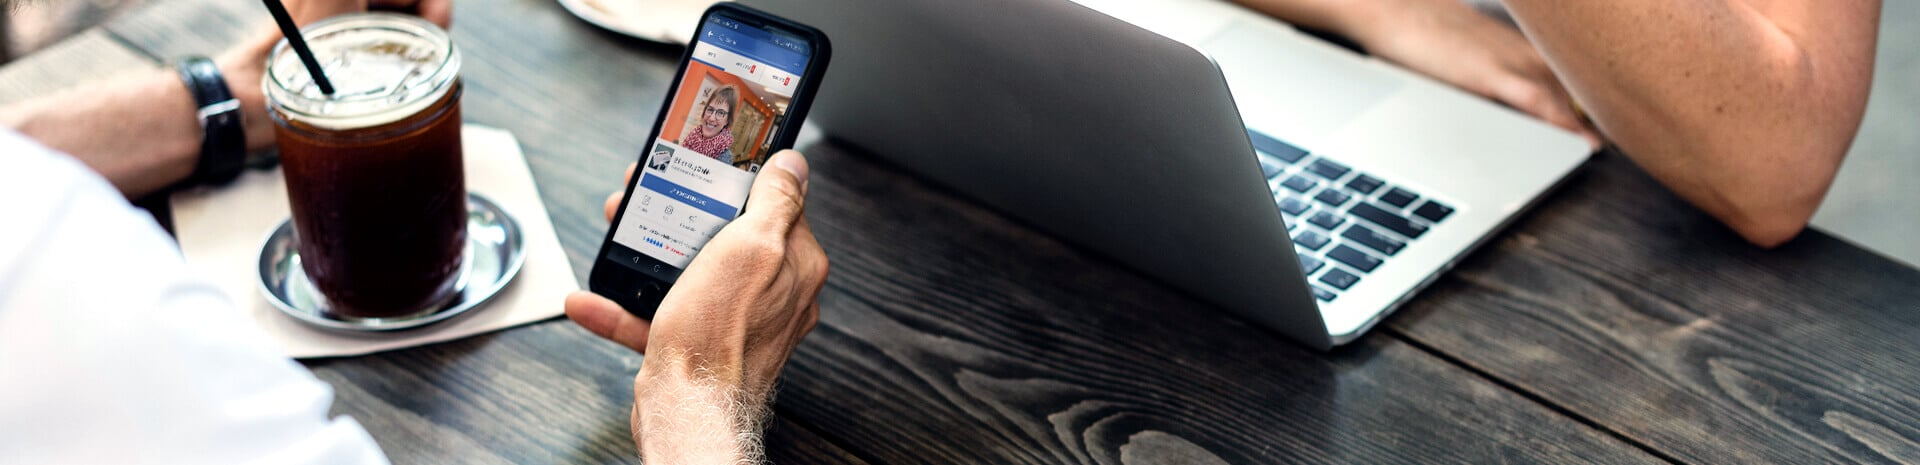 Headerbild Social Media Beratung - Stephan-Benz.de